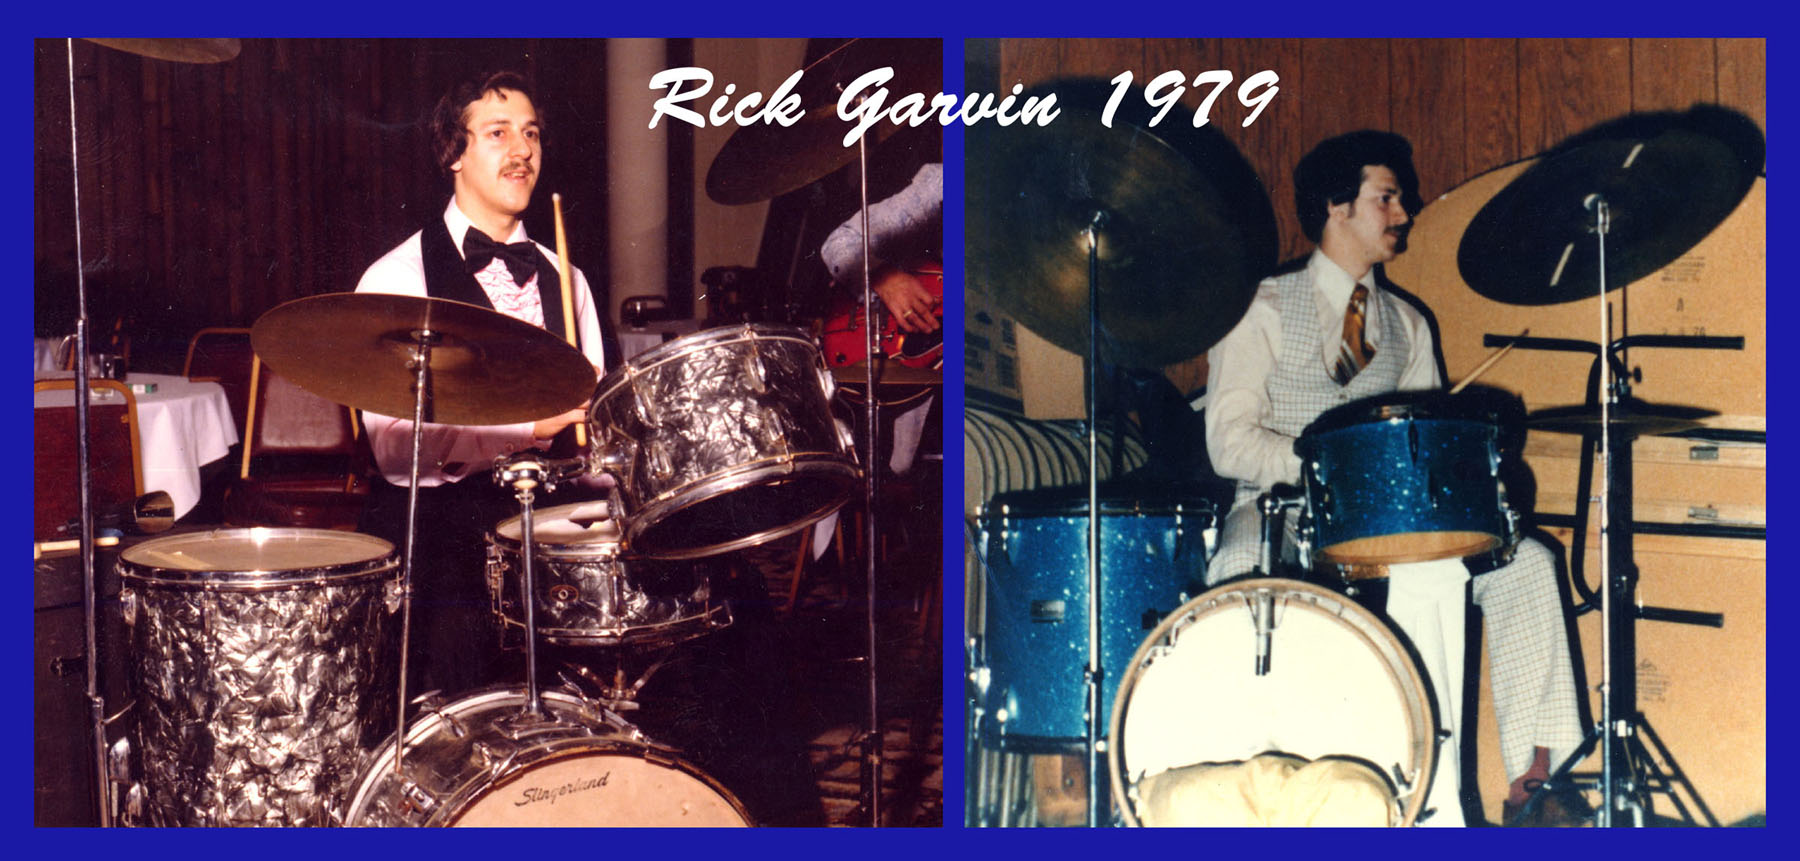 RICK-1979.jpg